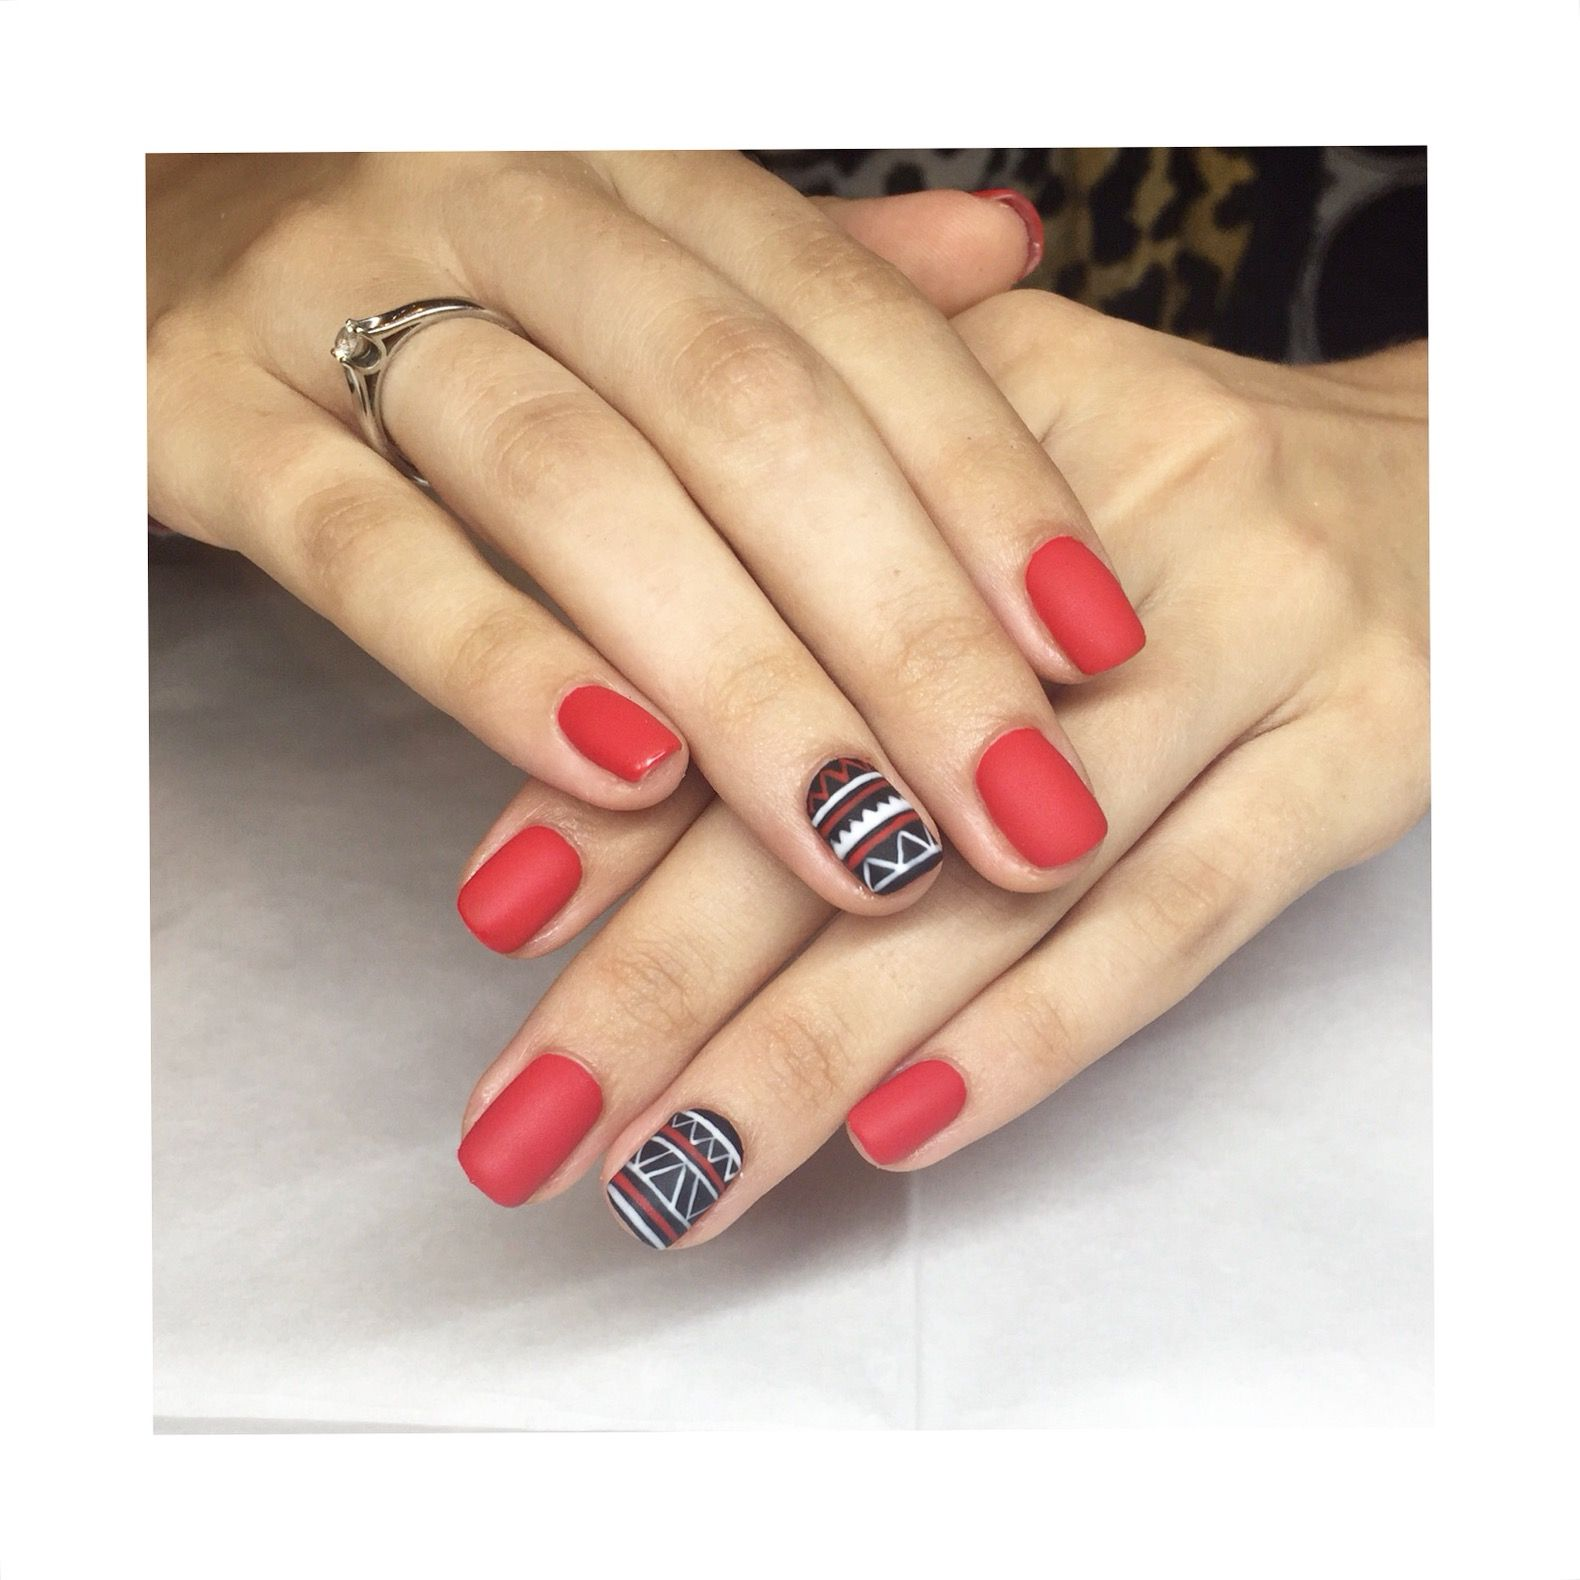 A Love Story: A Skittle Nail Art Design